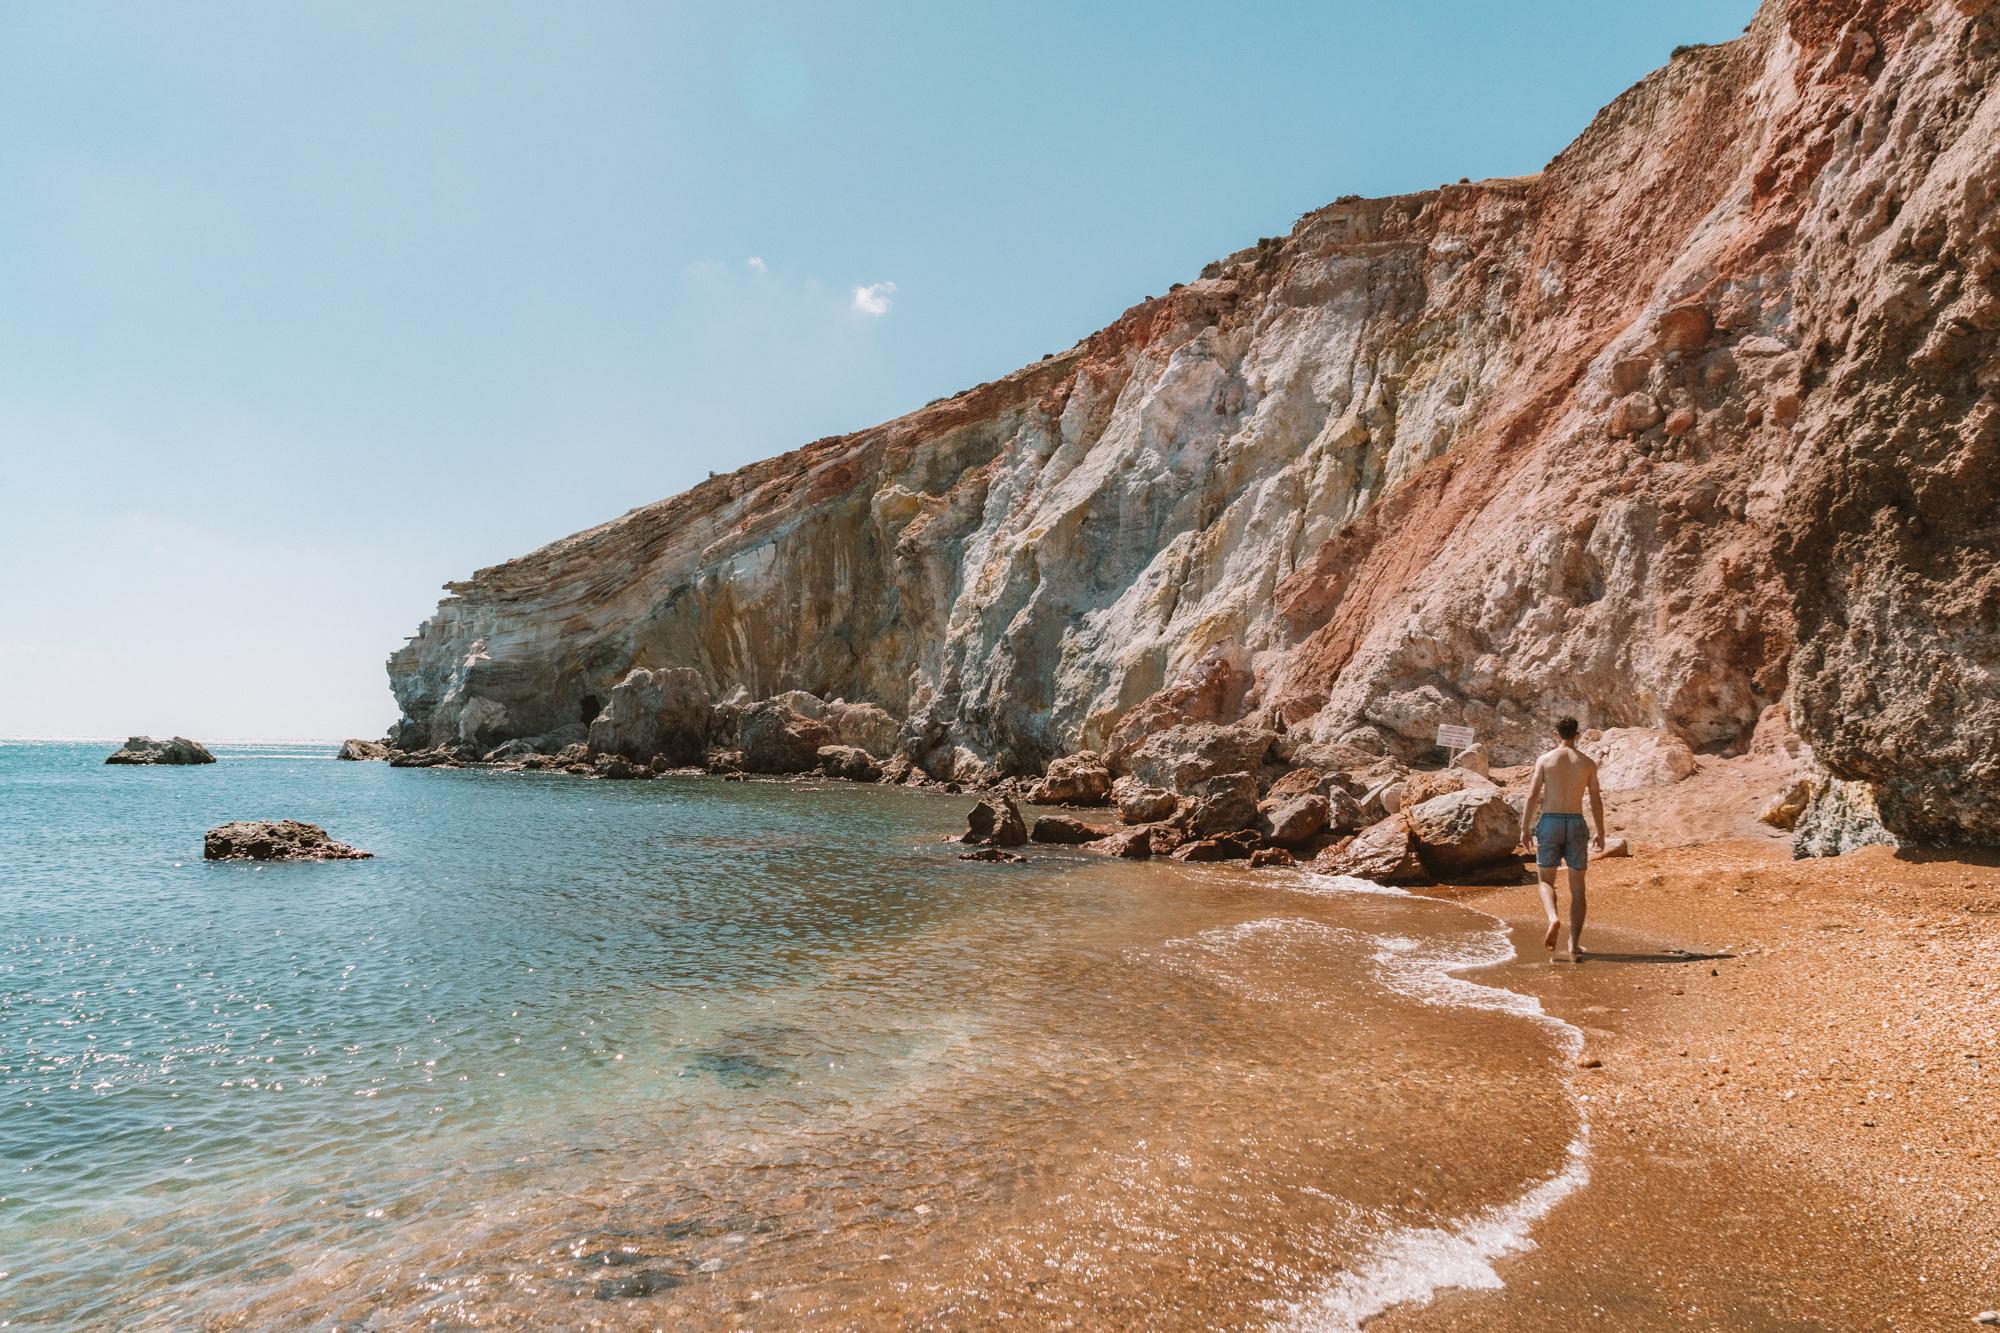 Paliochori Beach in Milos, Greece